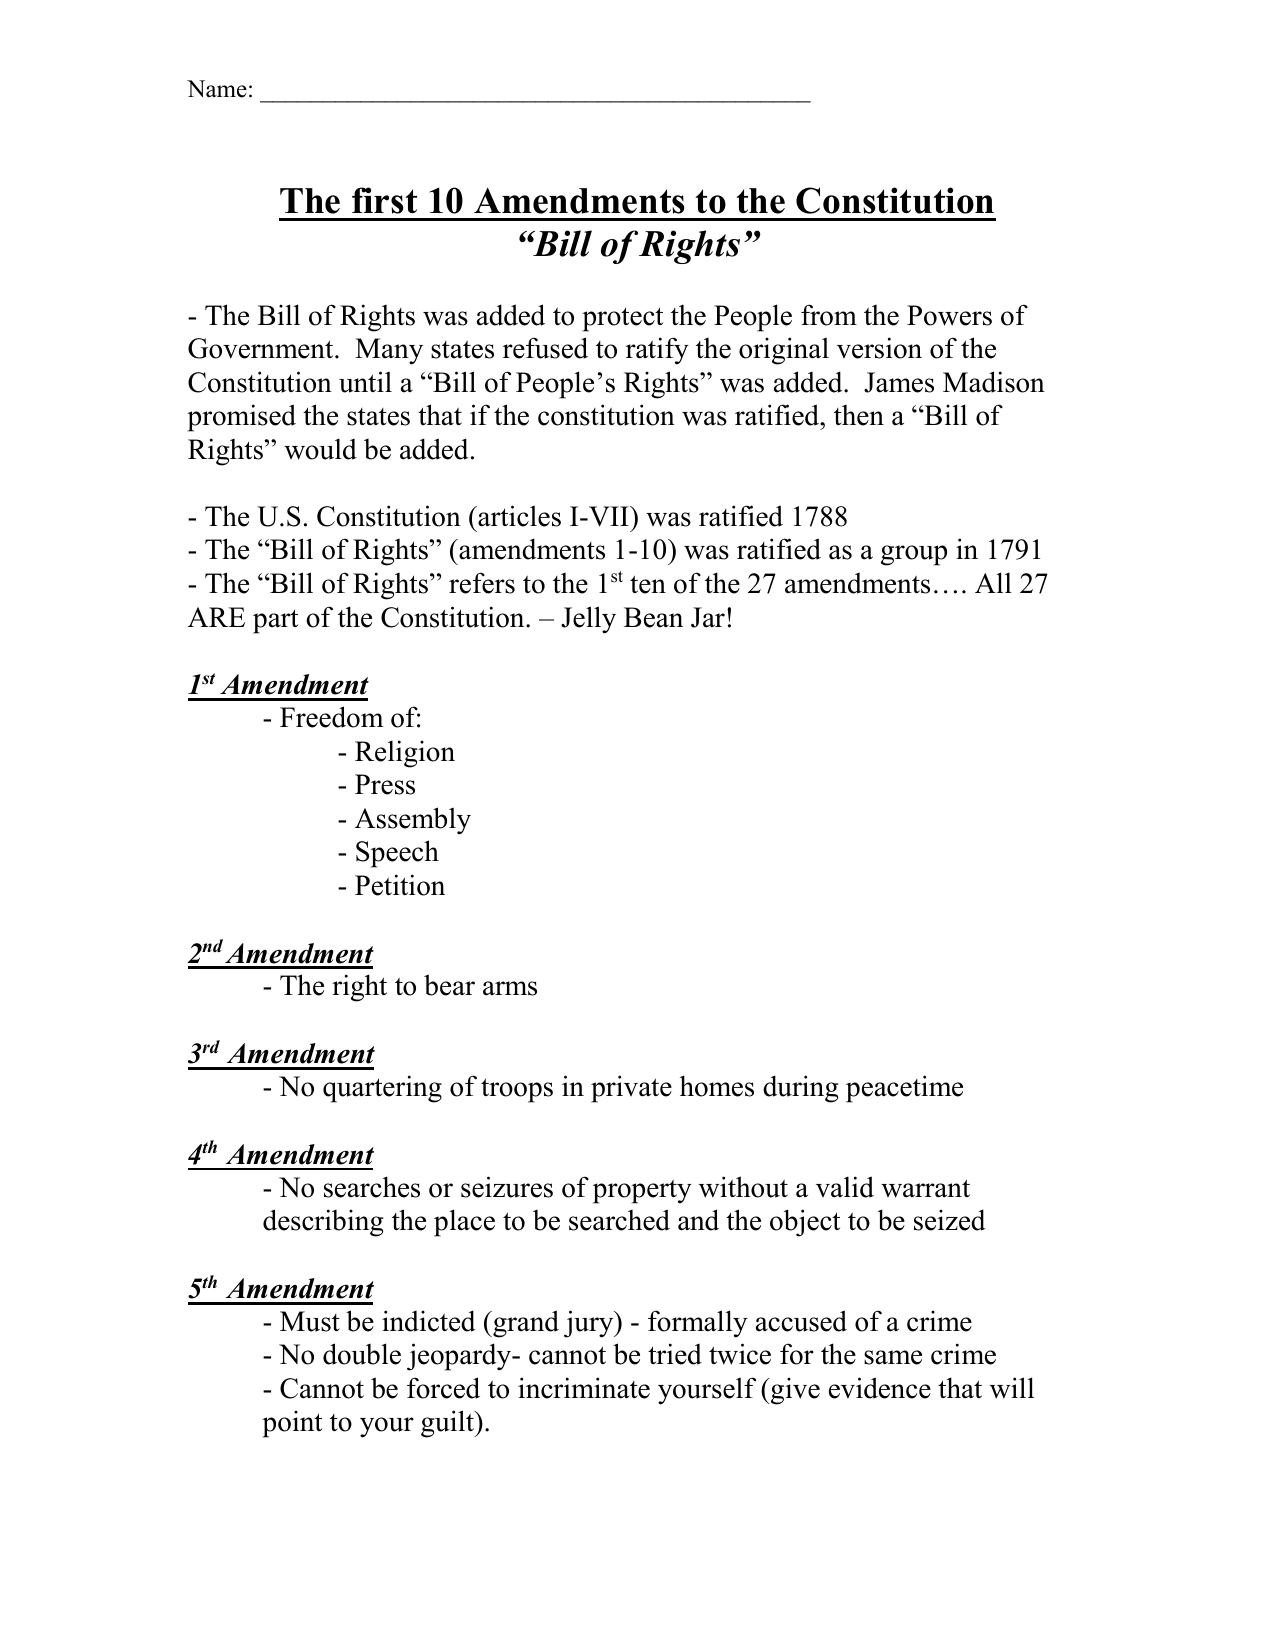 ️ What are the 1st 10 amendments. First Ten Amendments ...